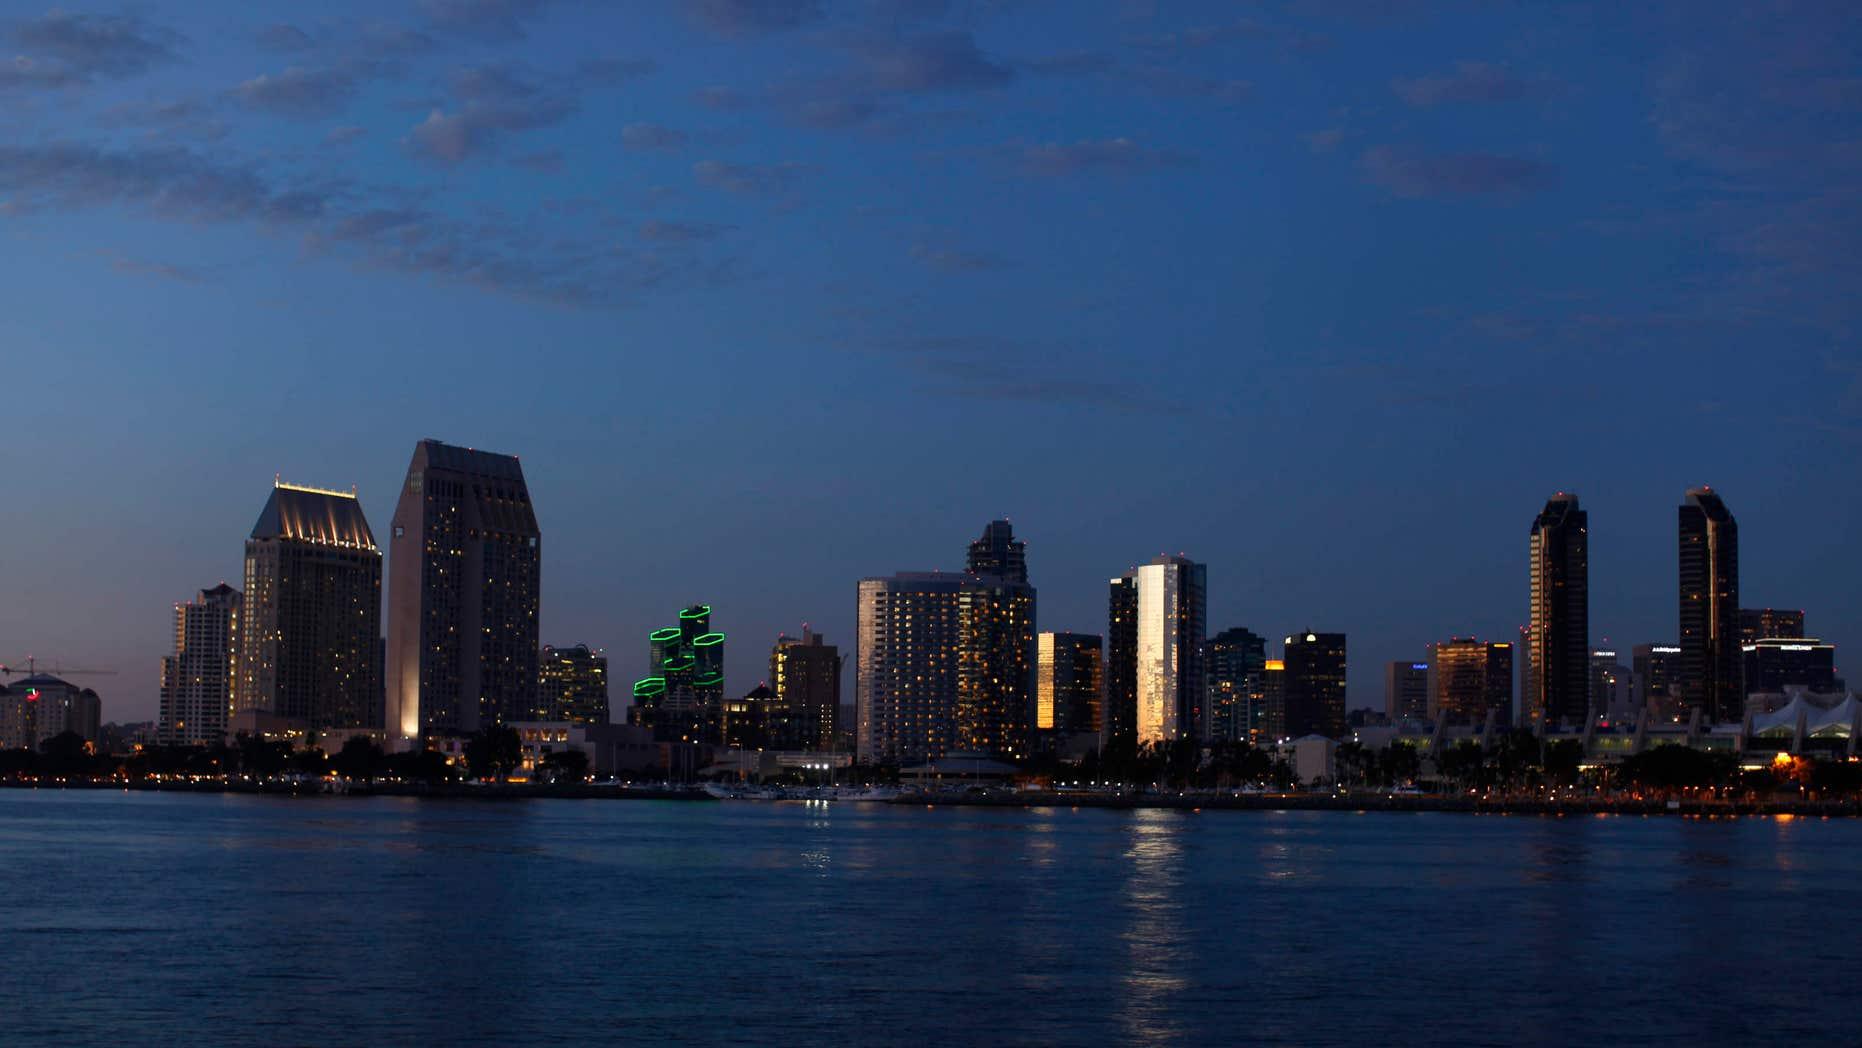 The skyline of San Diego, Calif.